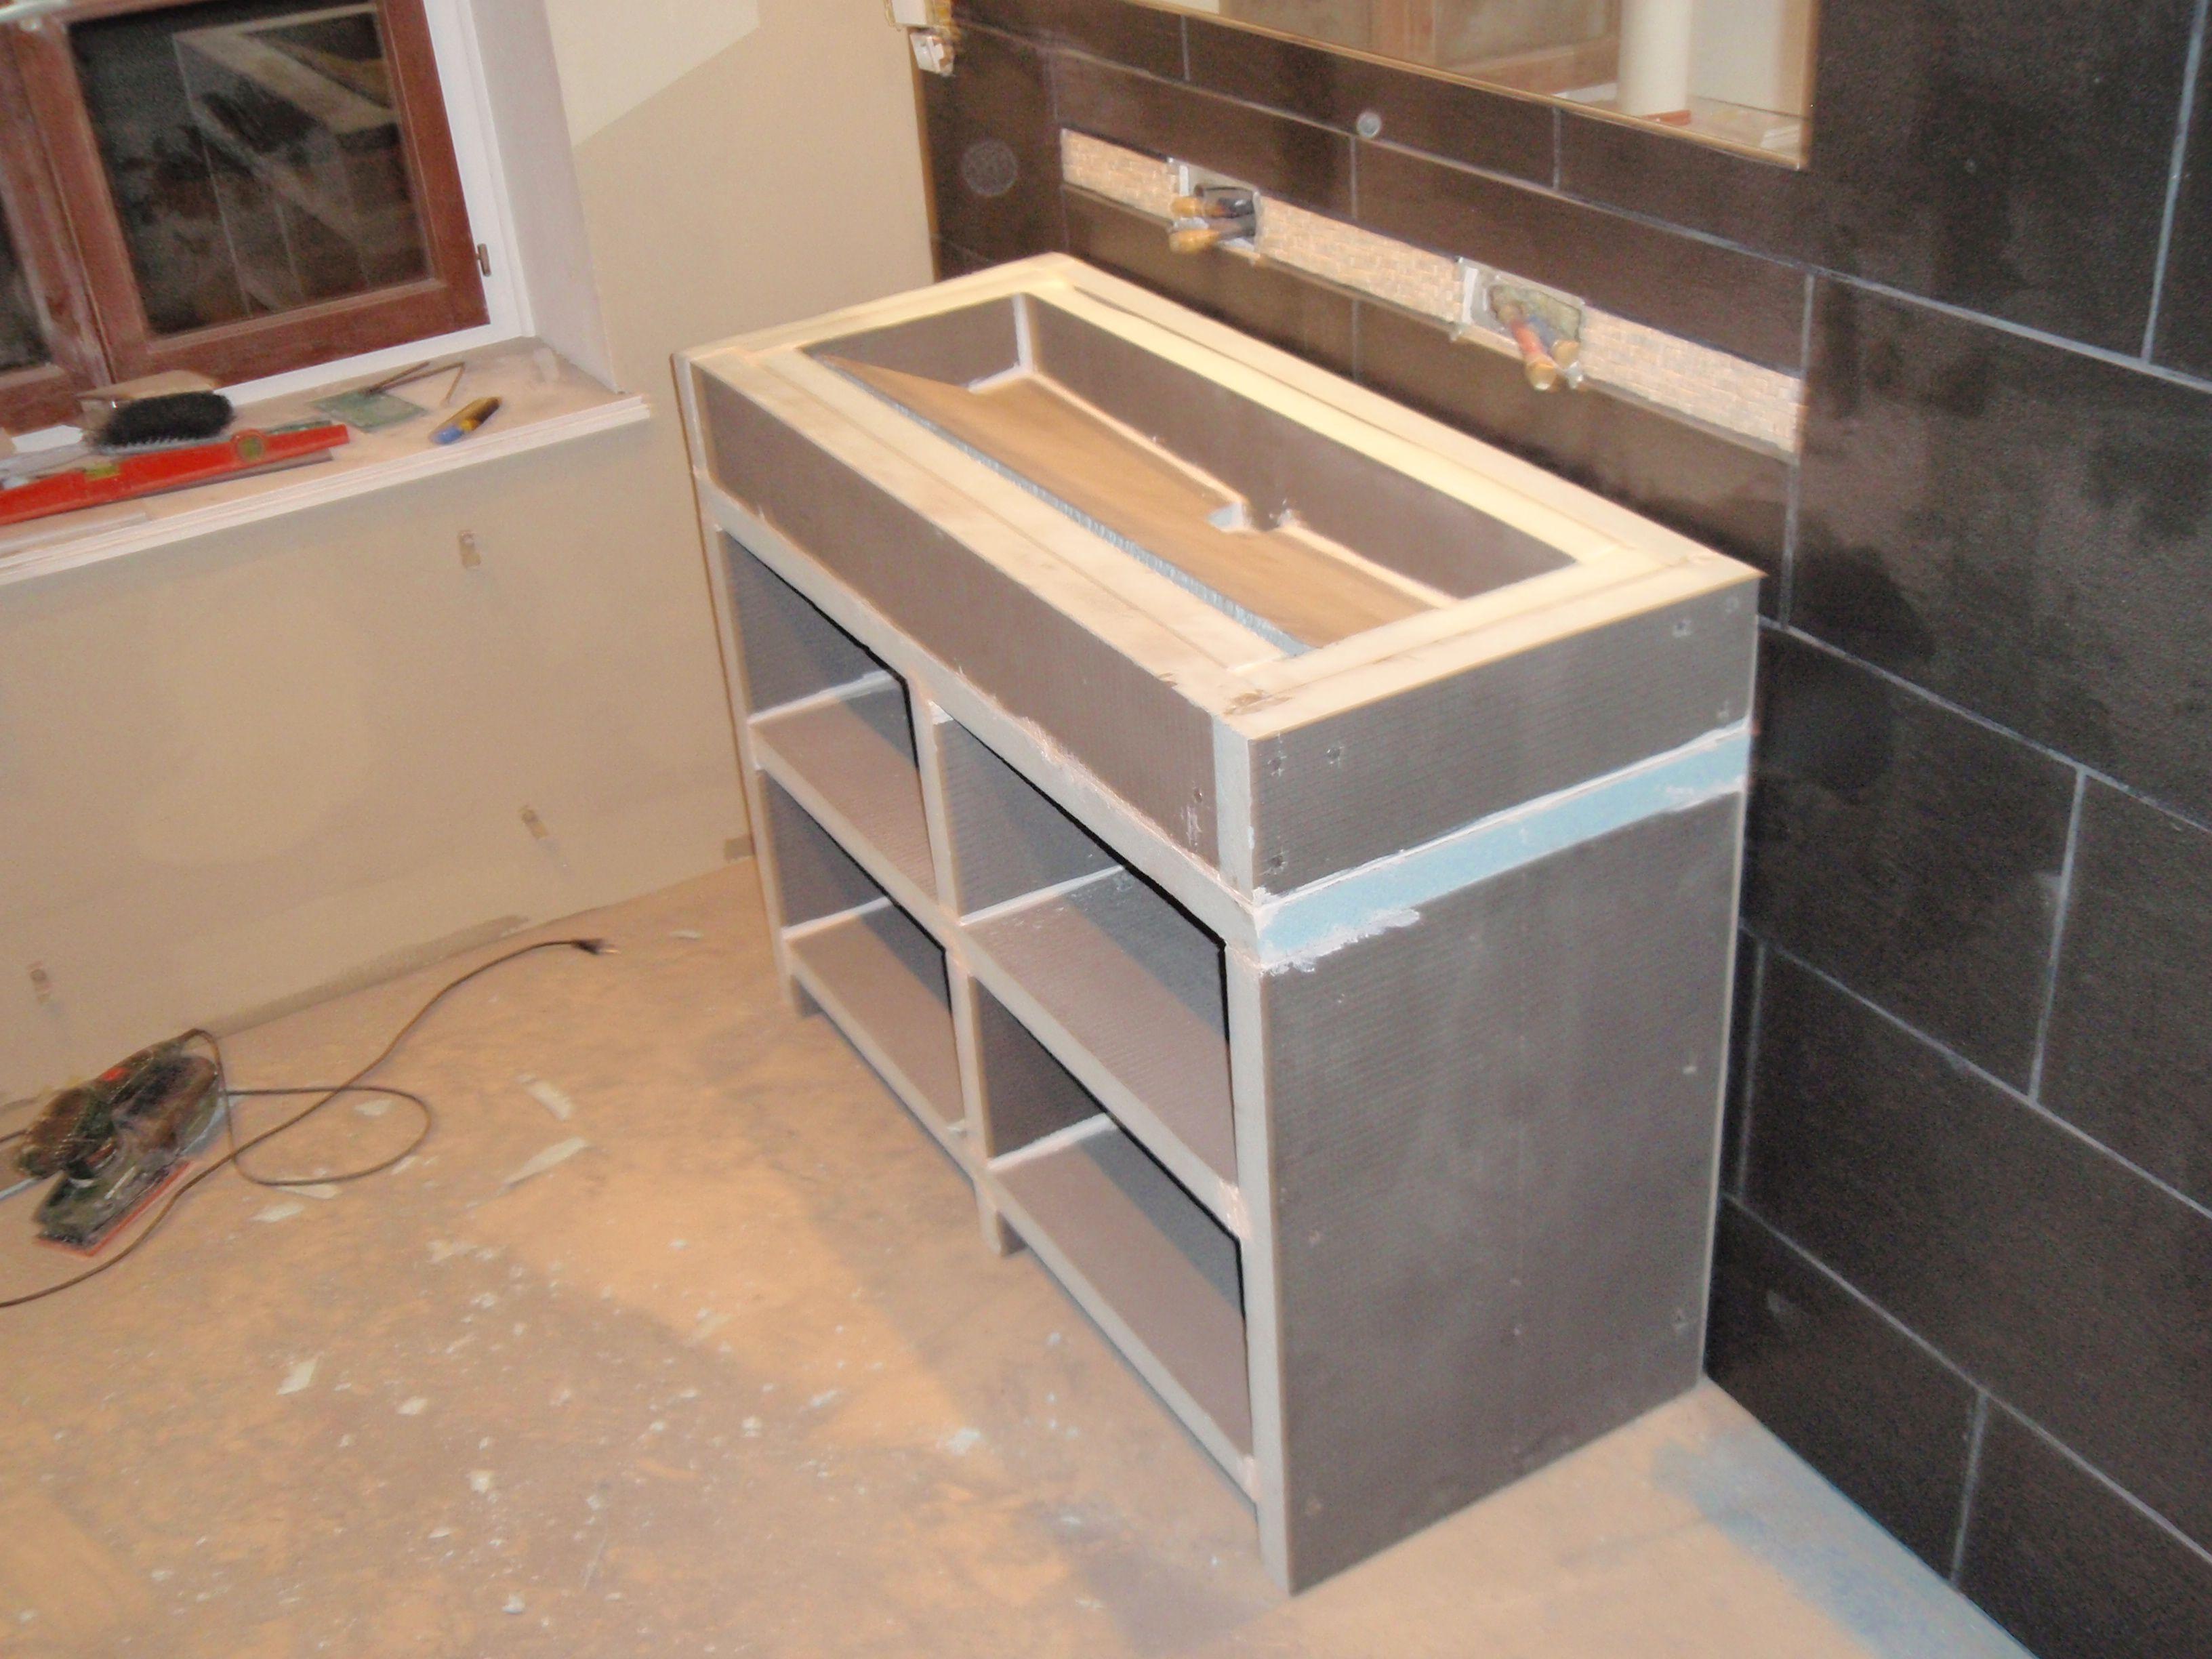 Fabrication de la vasque | Salle de bain | Pinterest | Renovierung